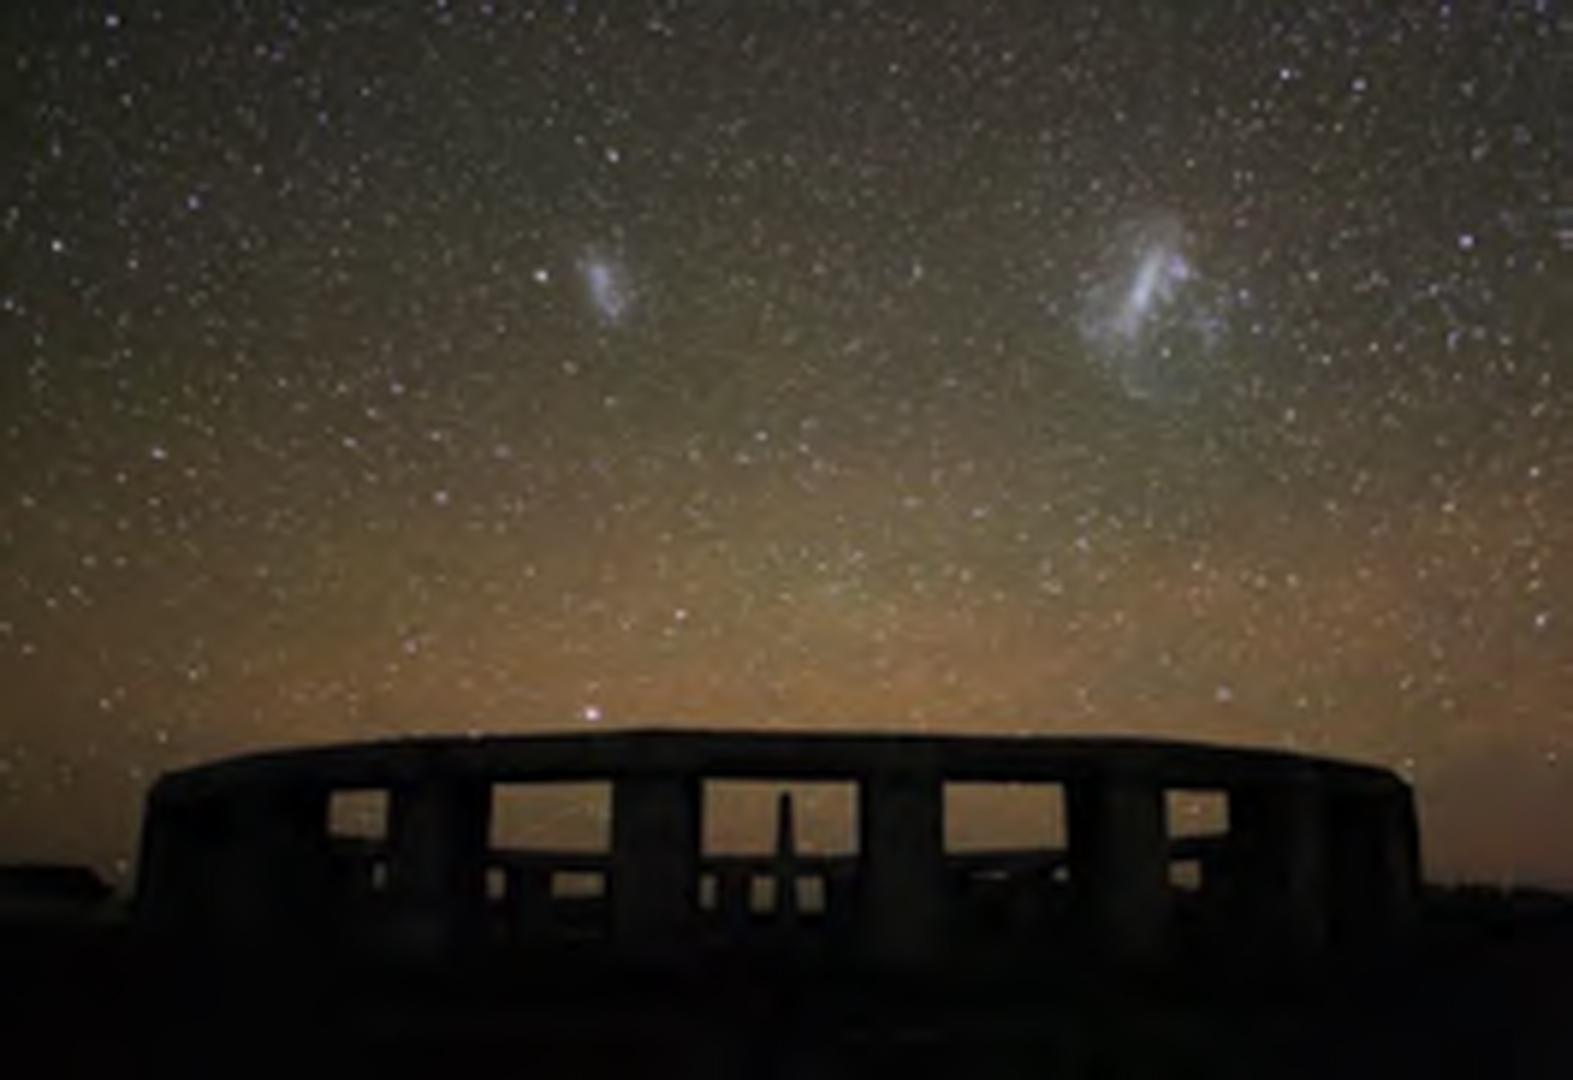 ©, Paul Moss, The Milky Way